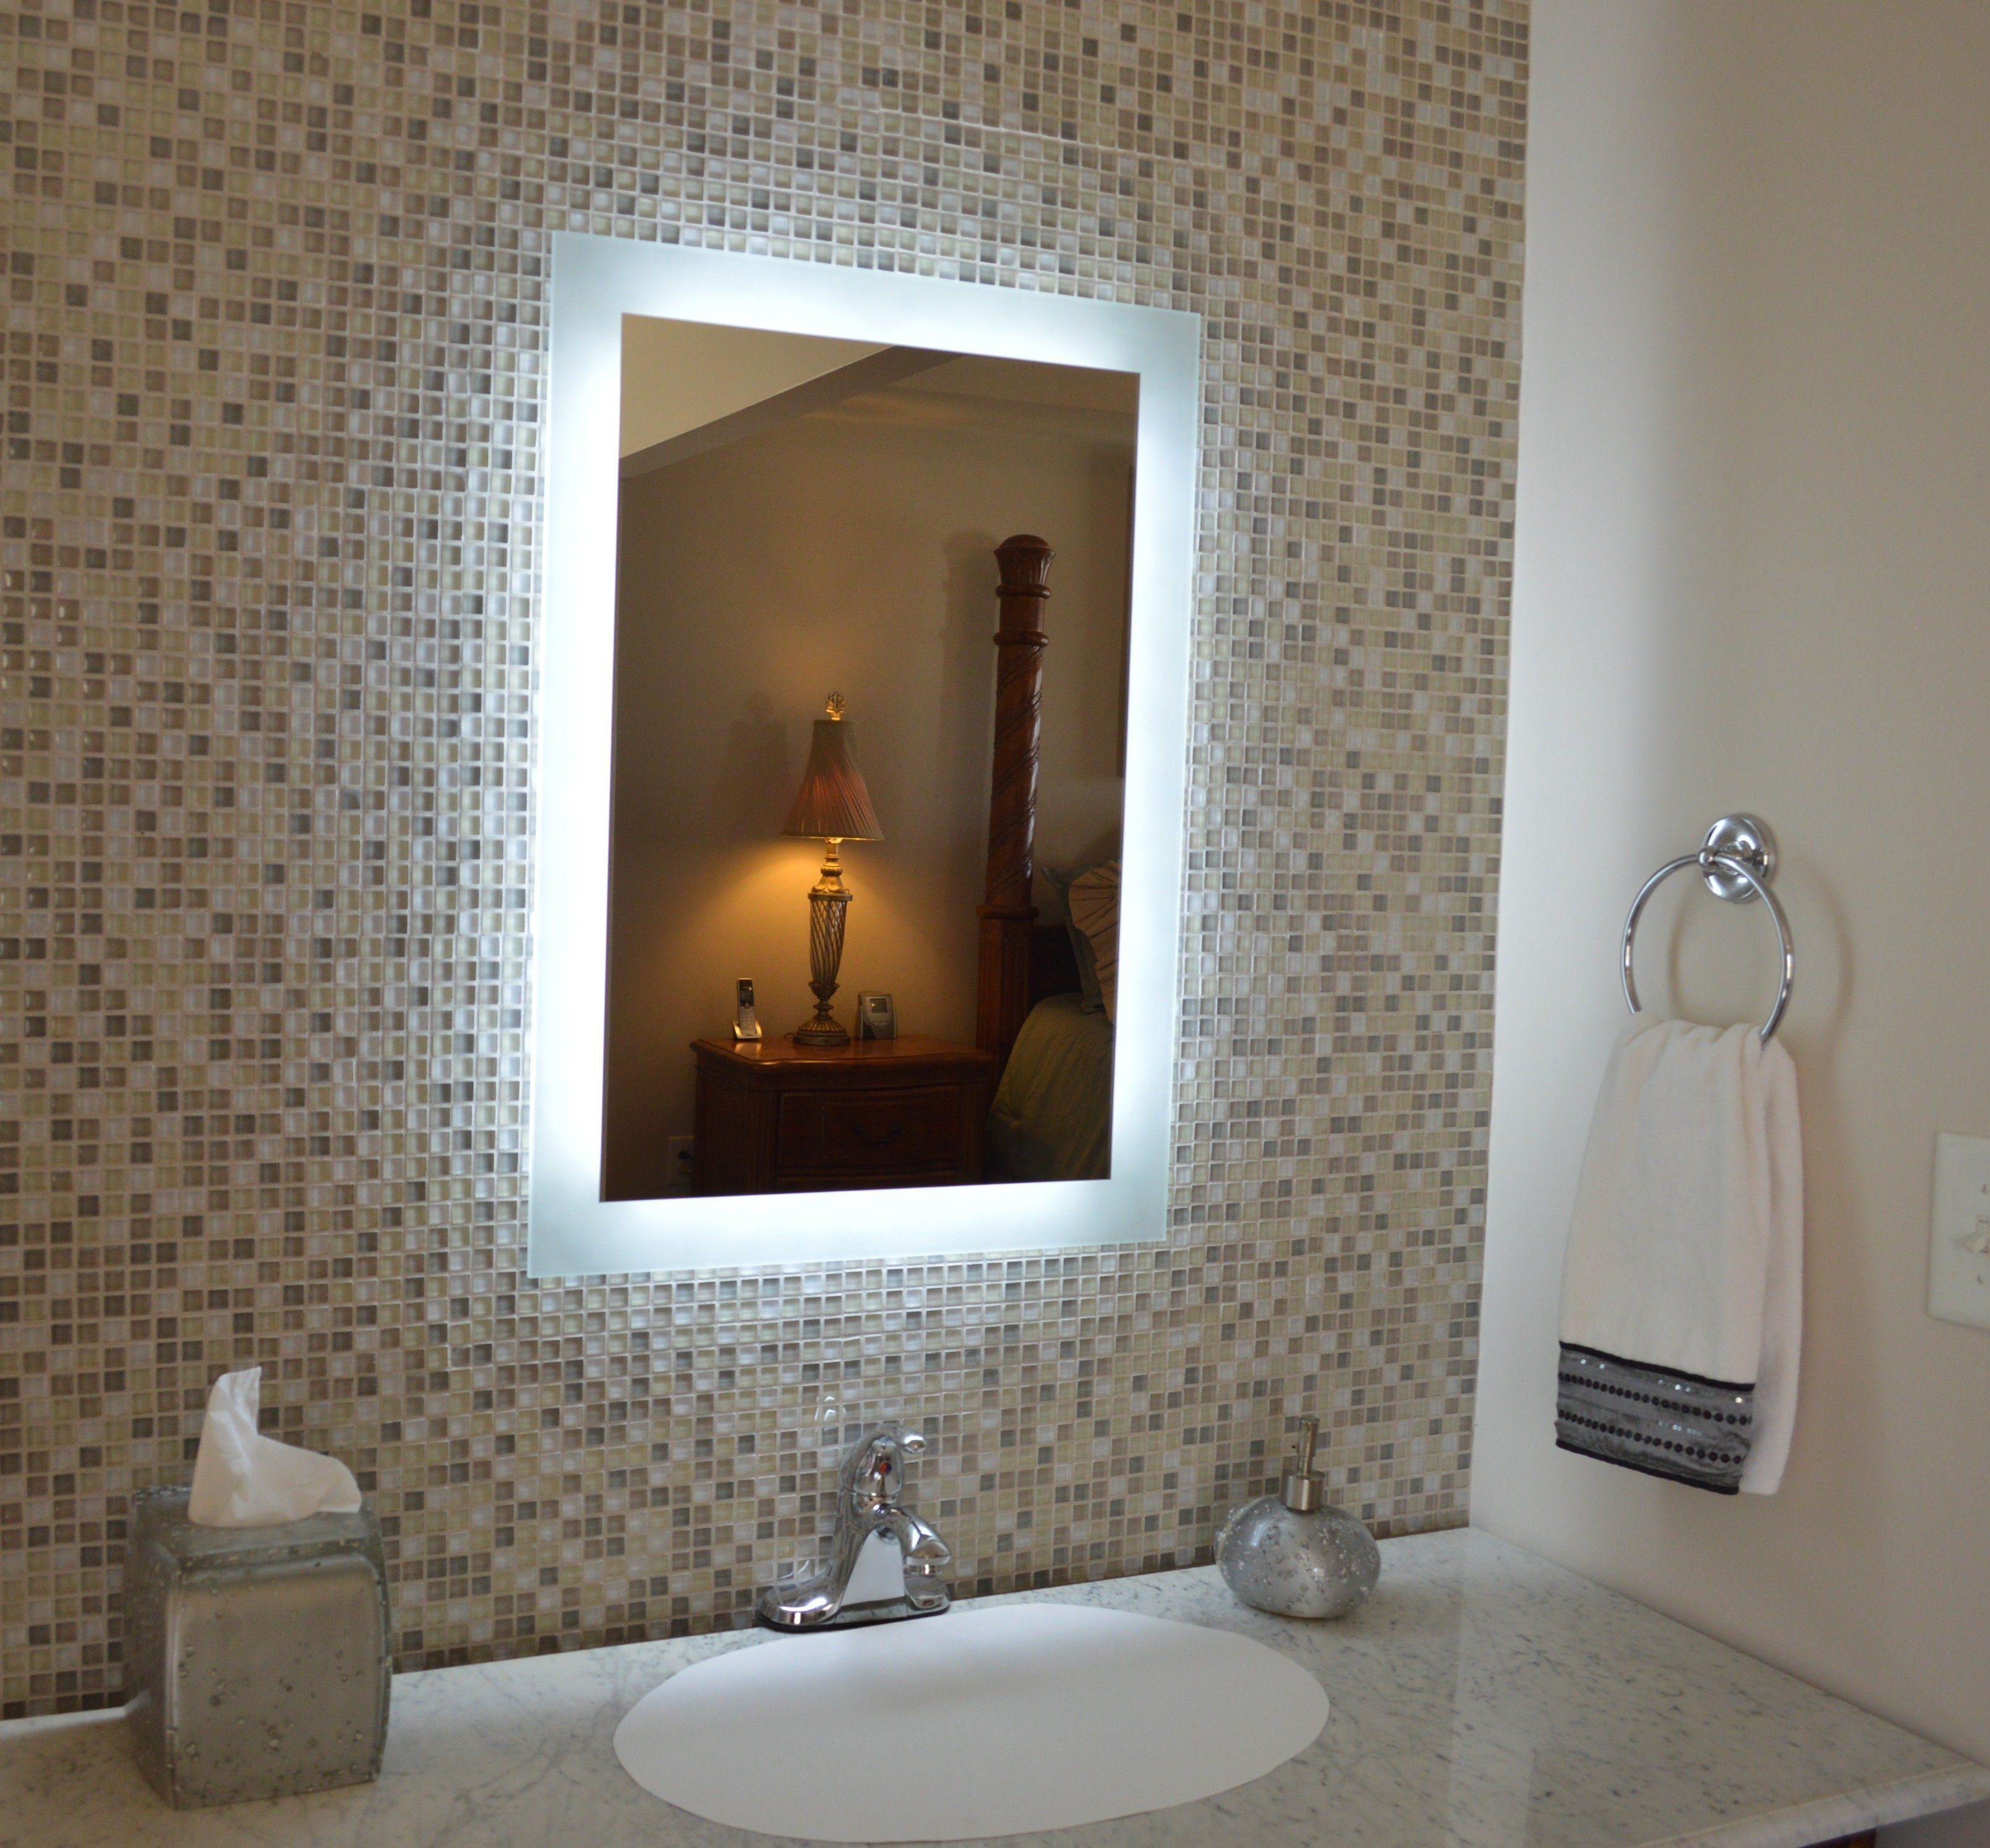 "SideLighted LED Bathroom Vanity Mirror 20"" Wide x 28"